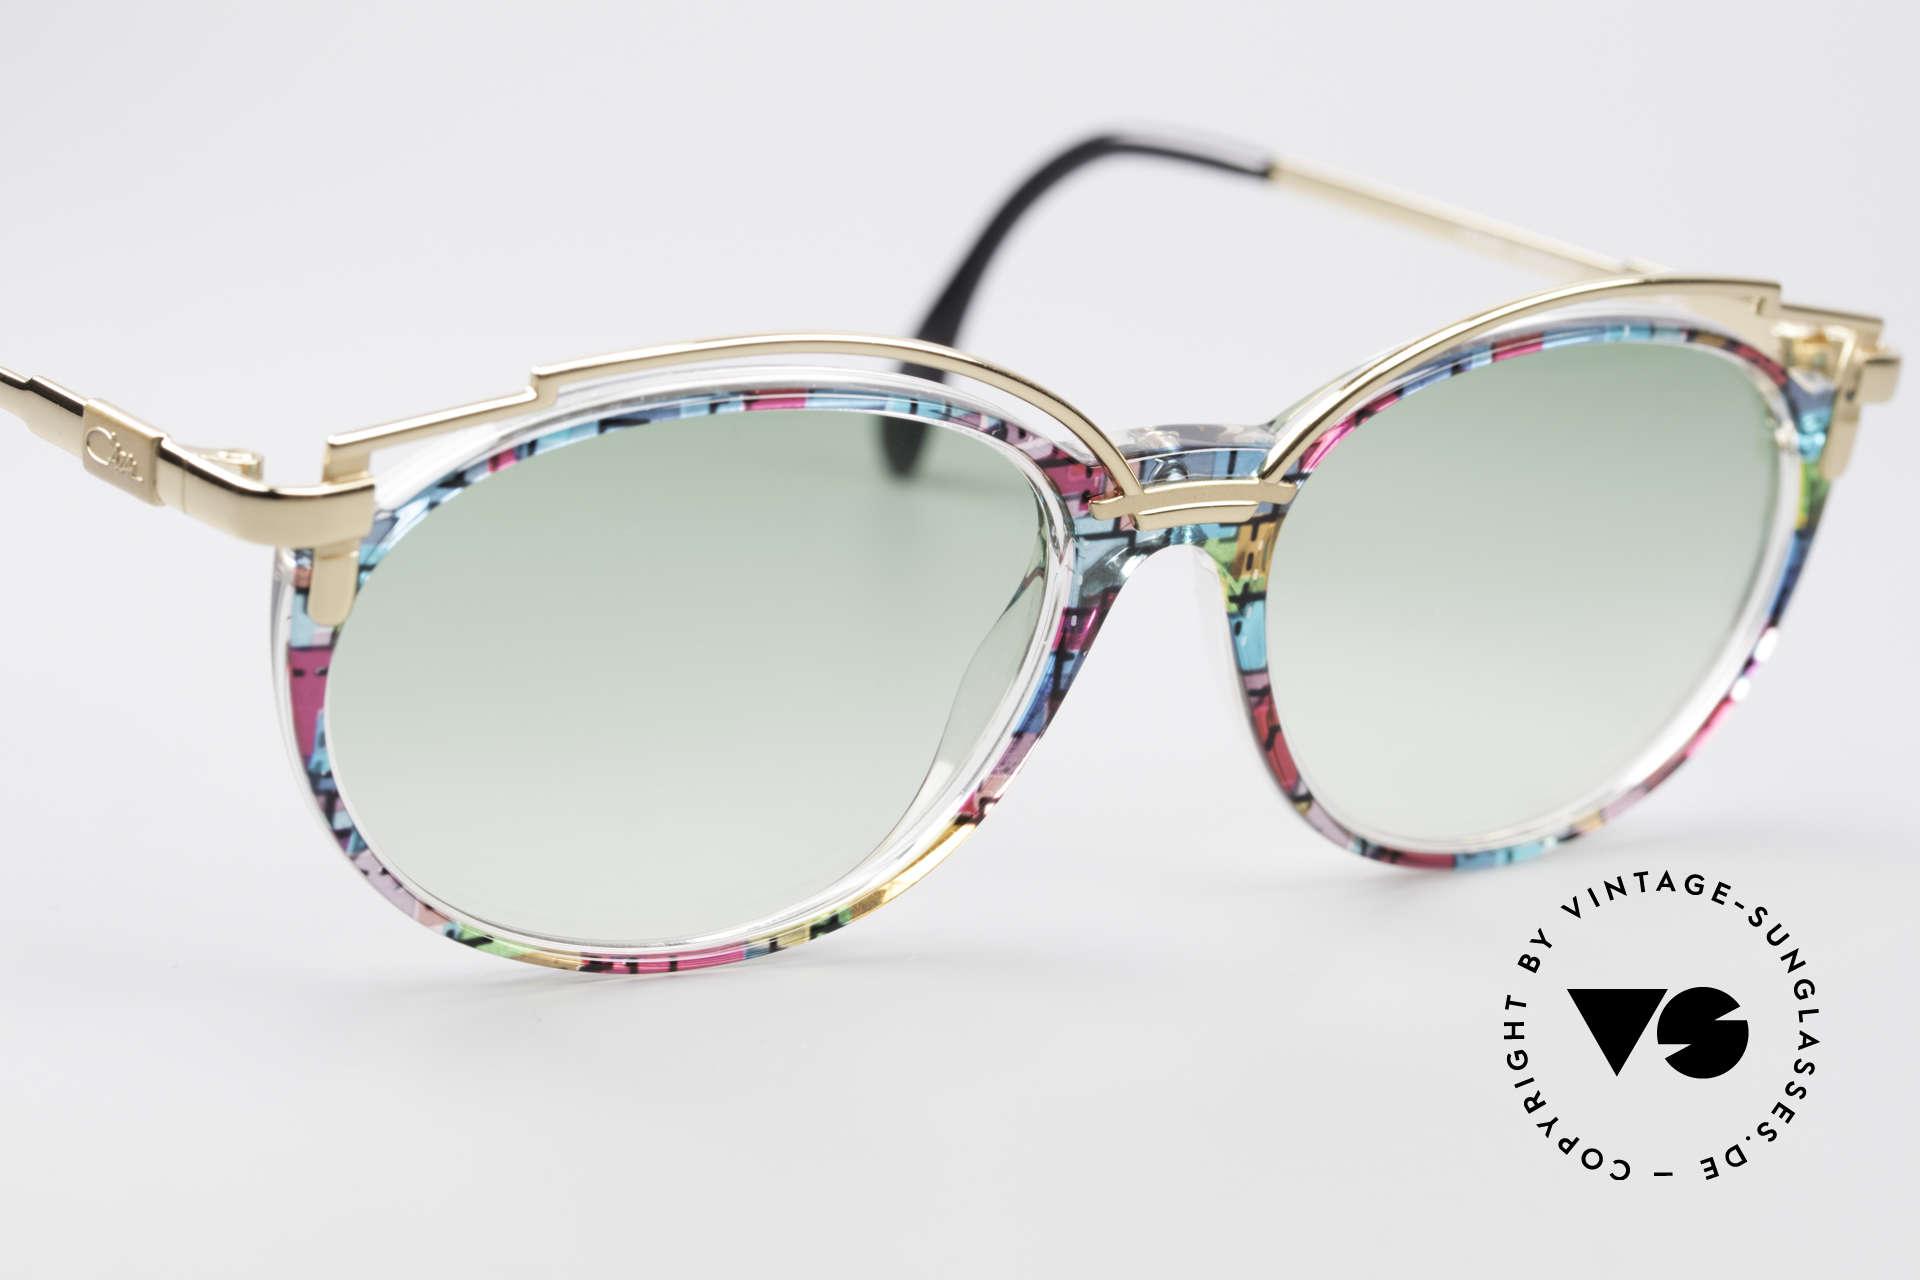 Cazal 358 No Retro True Vintage Shades, unworn, NOS (like all our rare VINTAGE Cazal eyewear), Made for Women